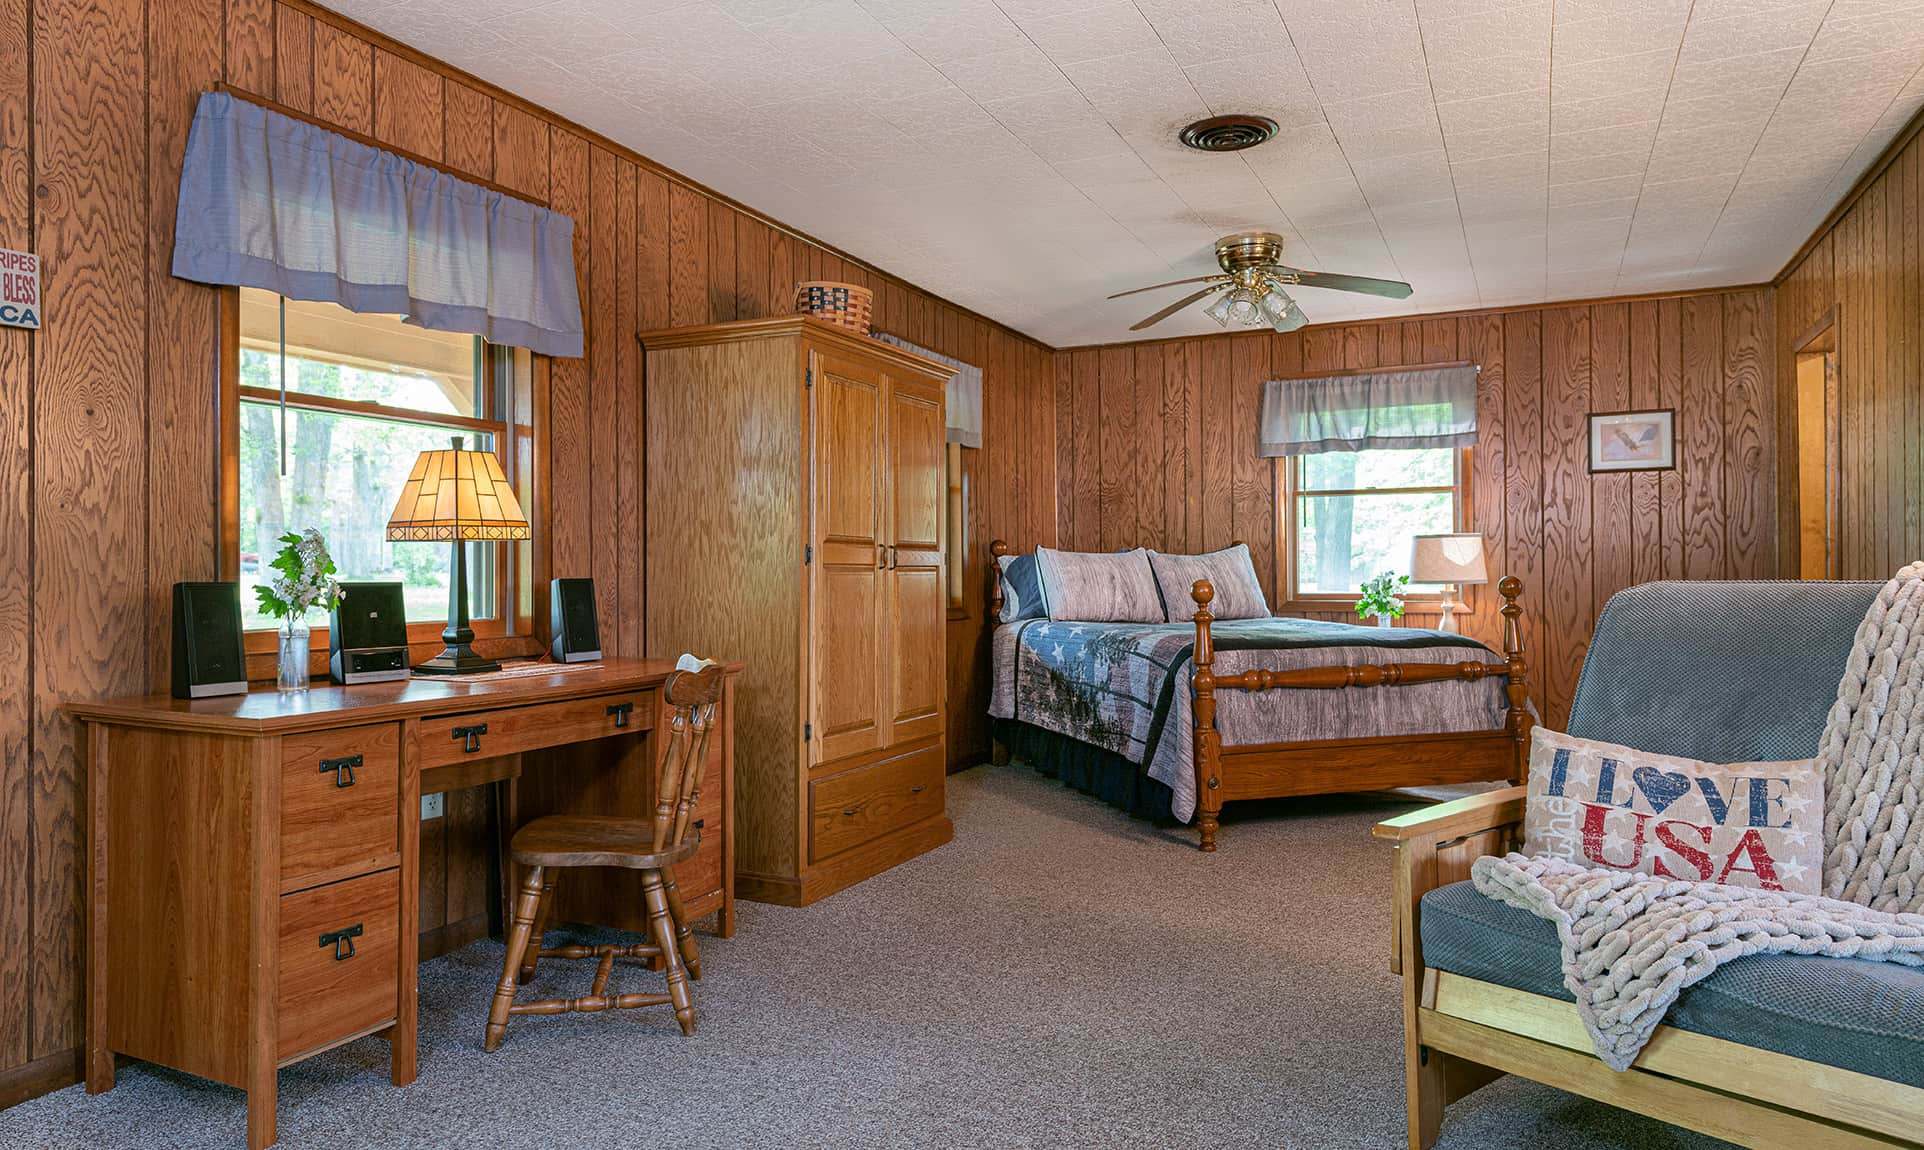 bed and desk in Americana Cabin near Buffalo Rock State Park